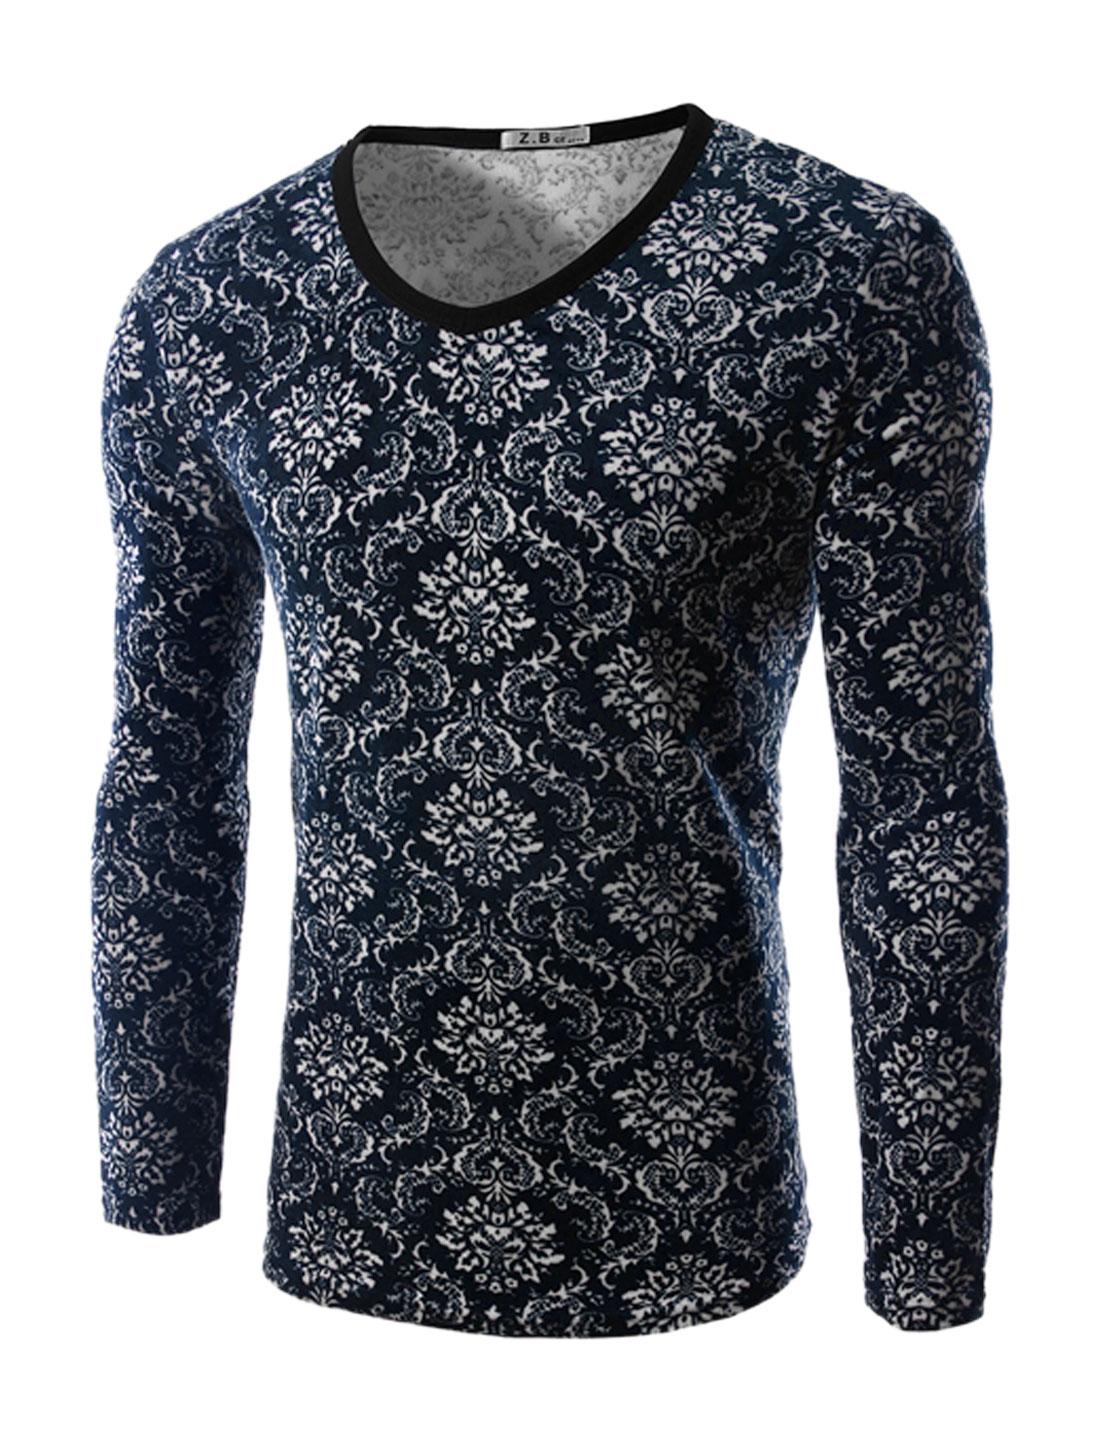 Man Long Sleeves Jacquard Slim Fit Plush T-Shirt Blue M